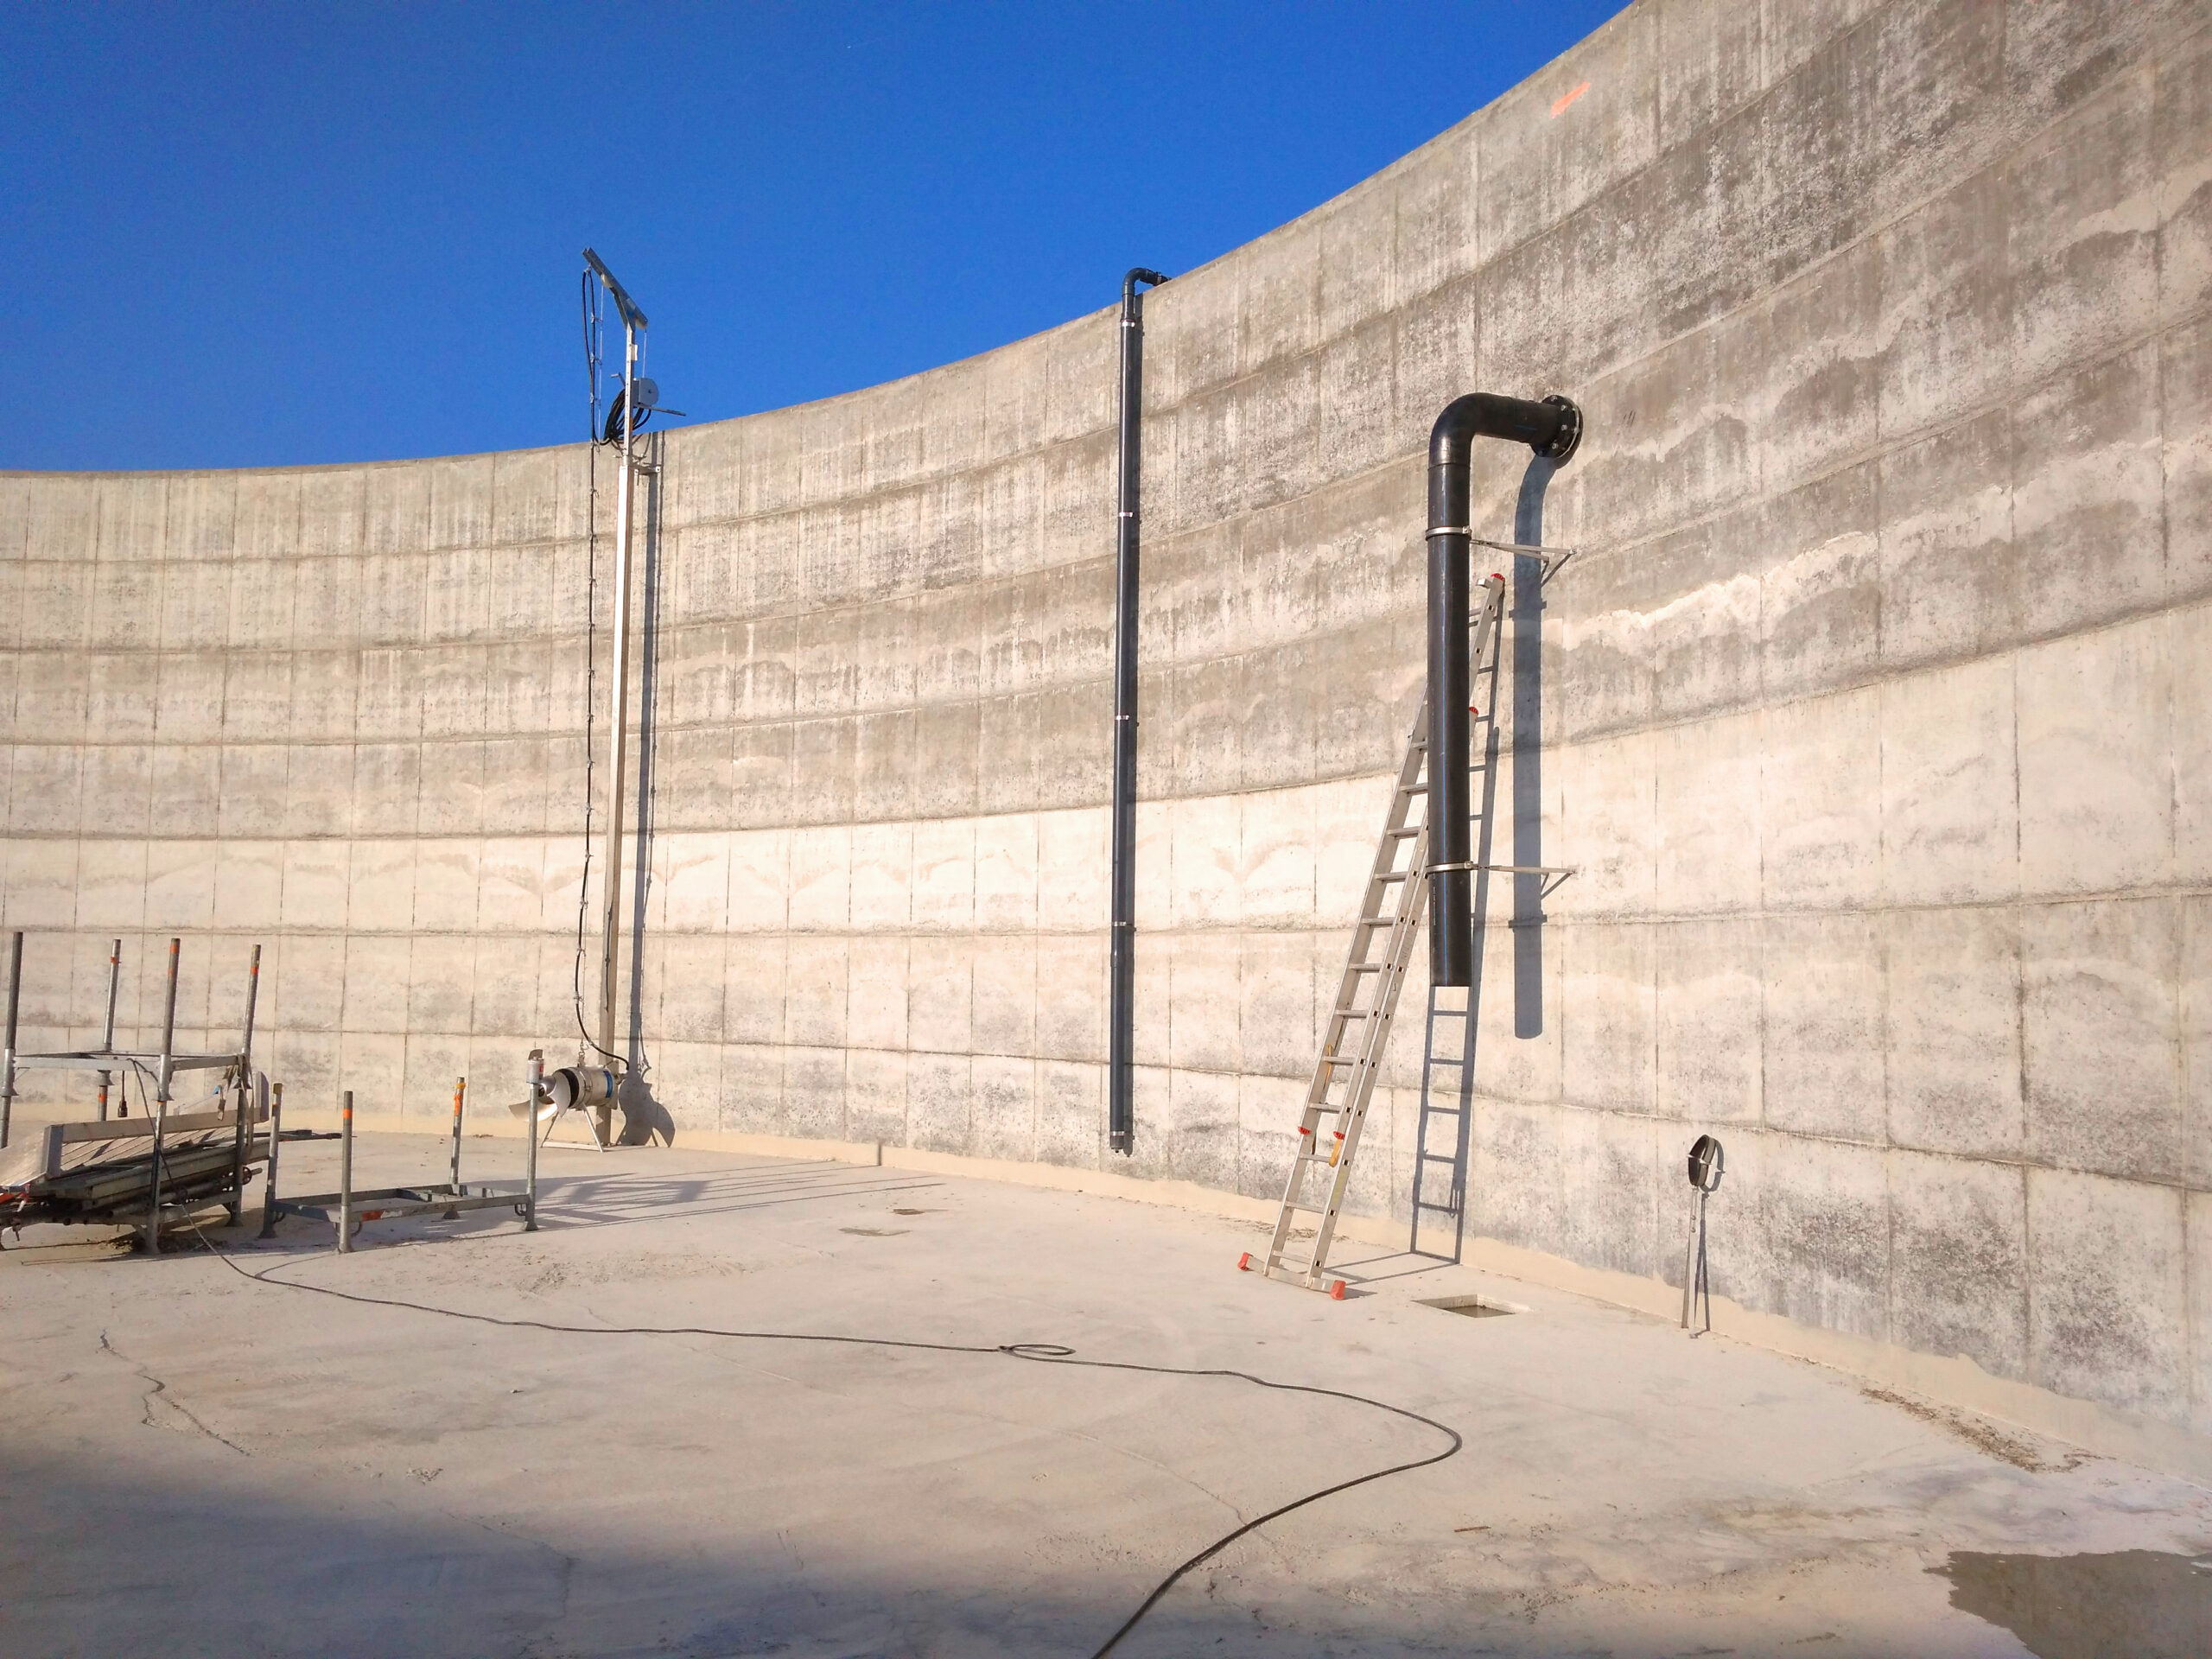 Biogás Planta Méthanisère Francia Montaje de Digestores 11